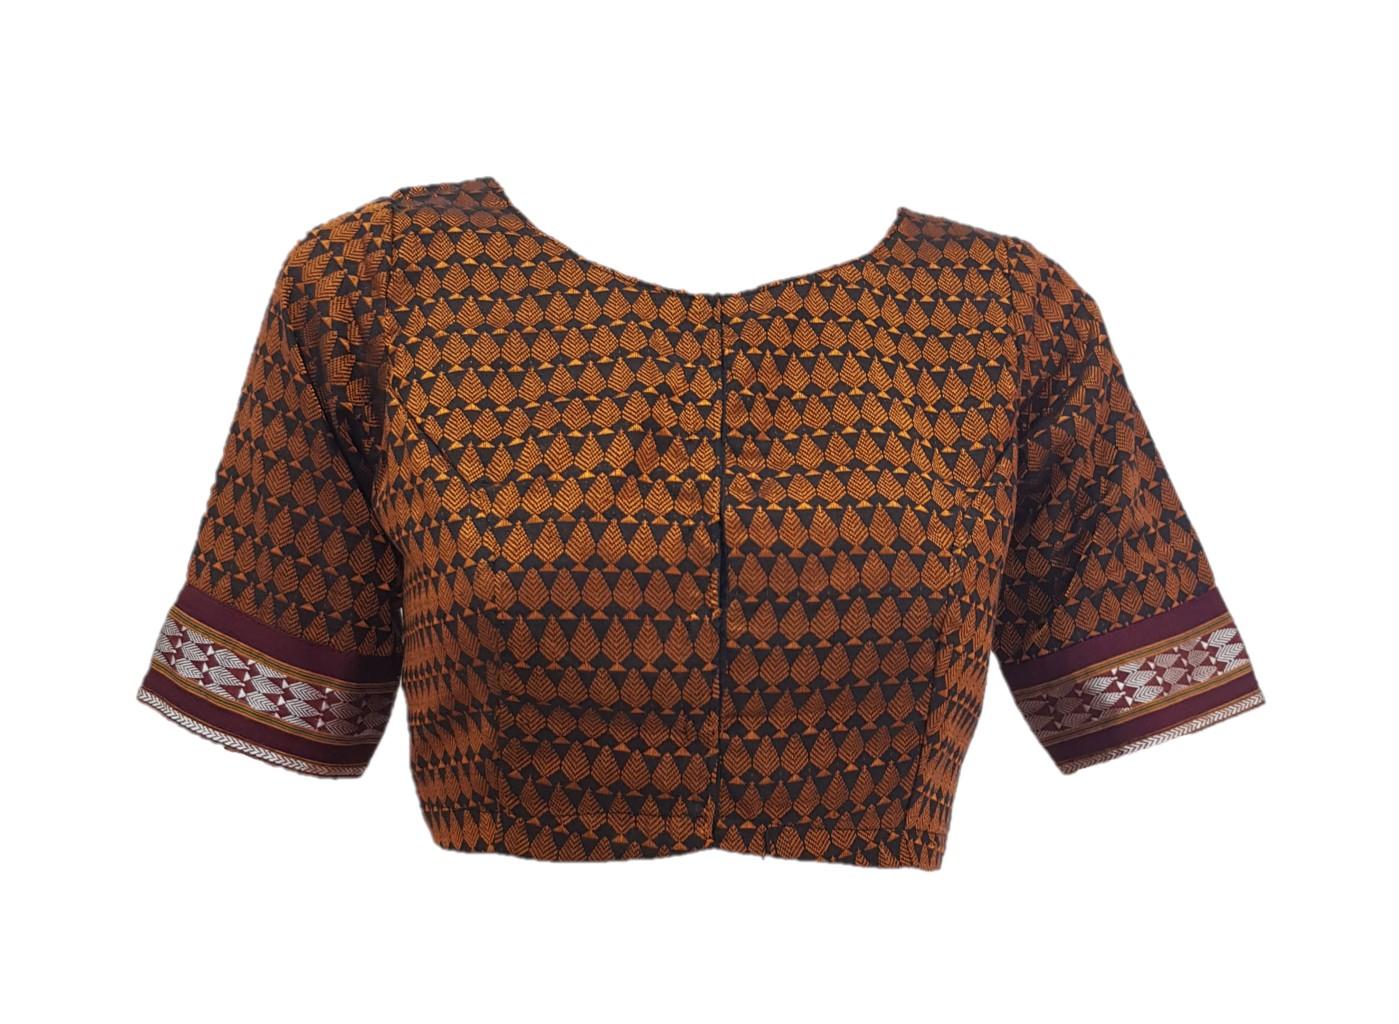 Ilkal Cotton Silk Khun Fabric Boat Neck Readymade Saree Blouse Copper Black : Picture